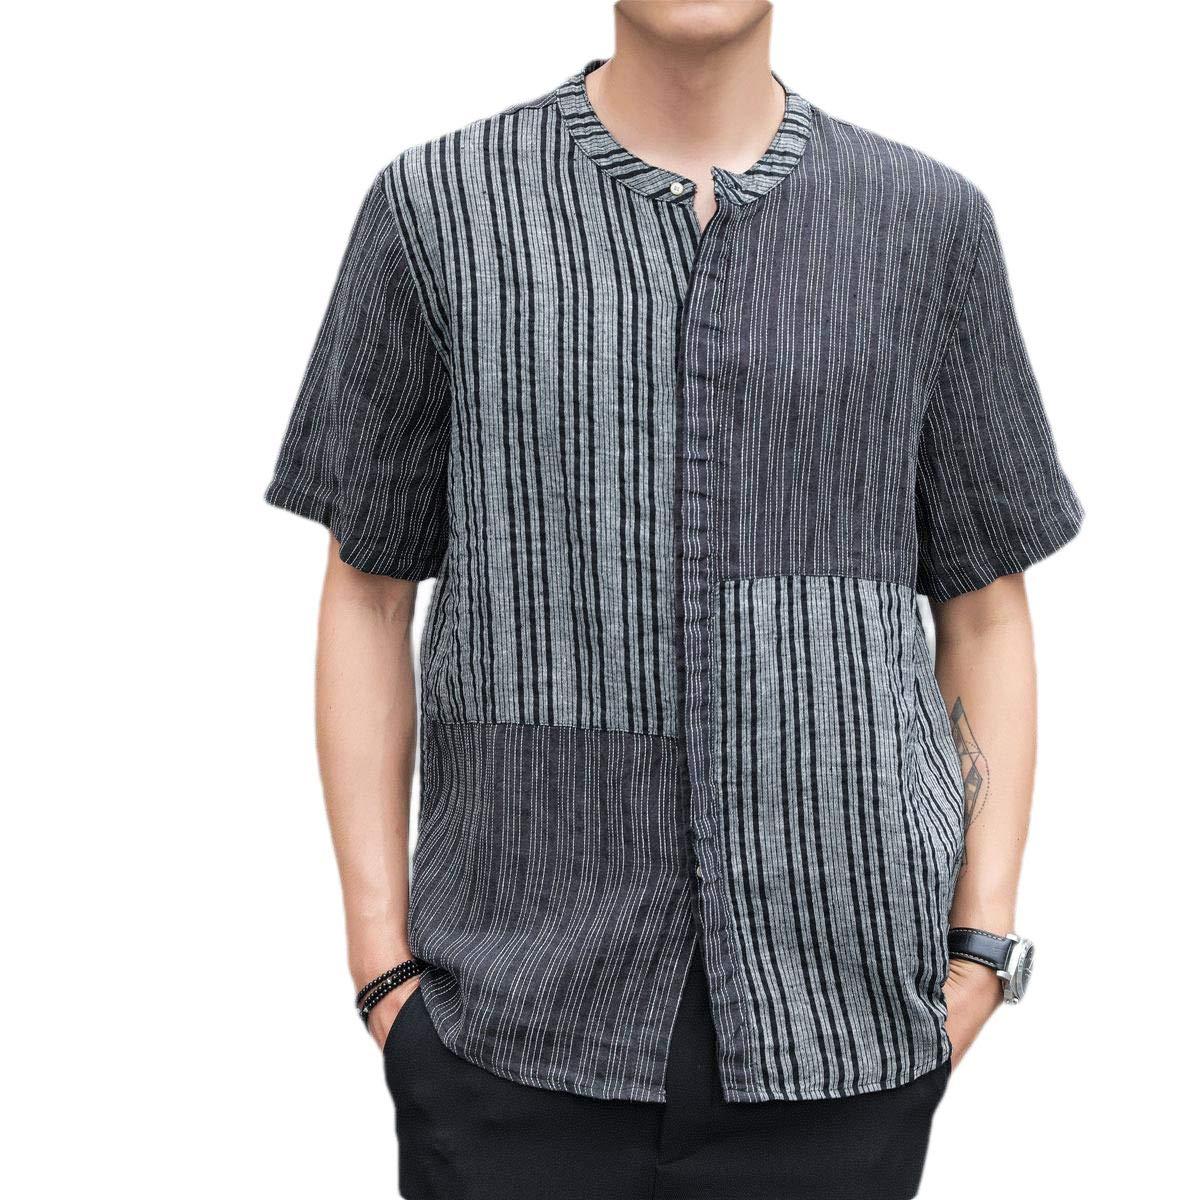 HEFASDM Mens Relaxed Fit Short-Sleeve Linen Summer Button Striped Loose Shirts